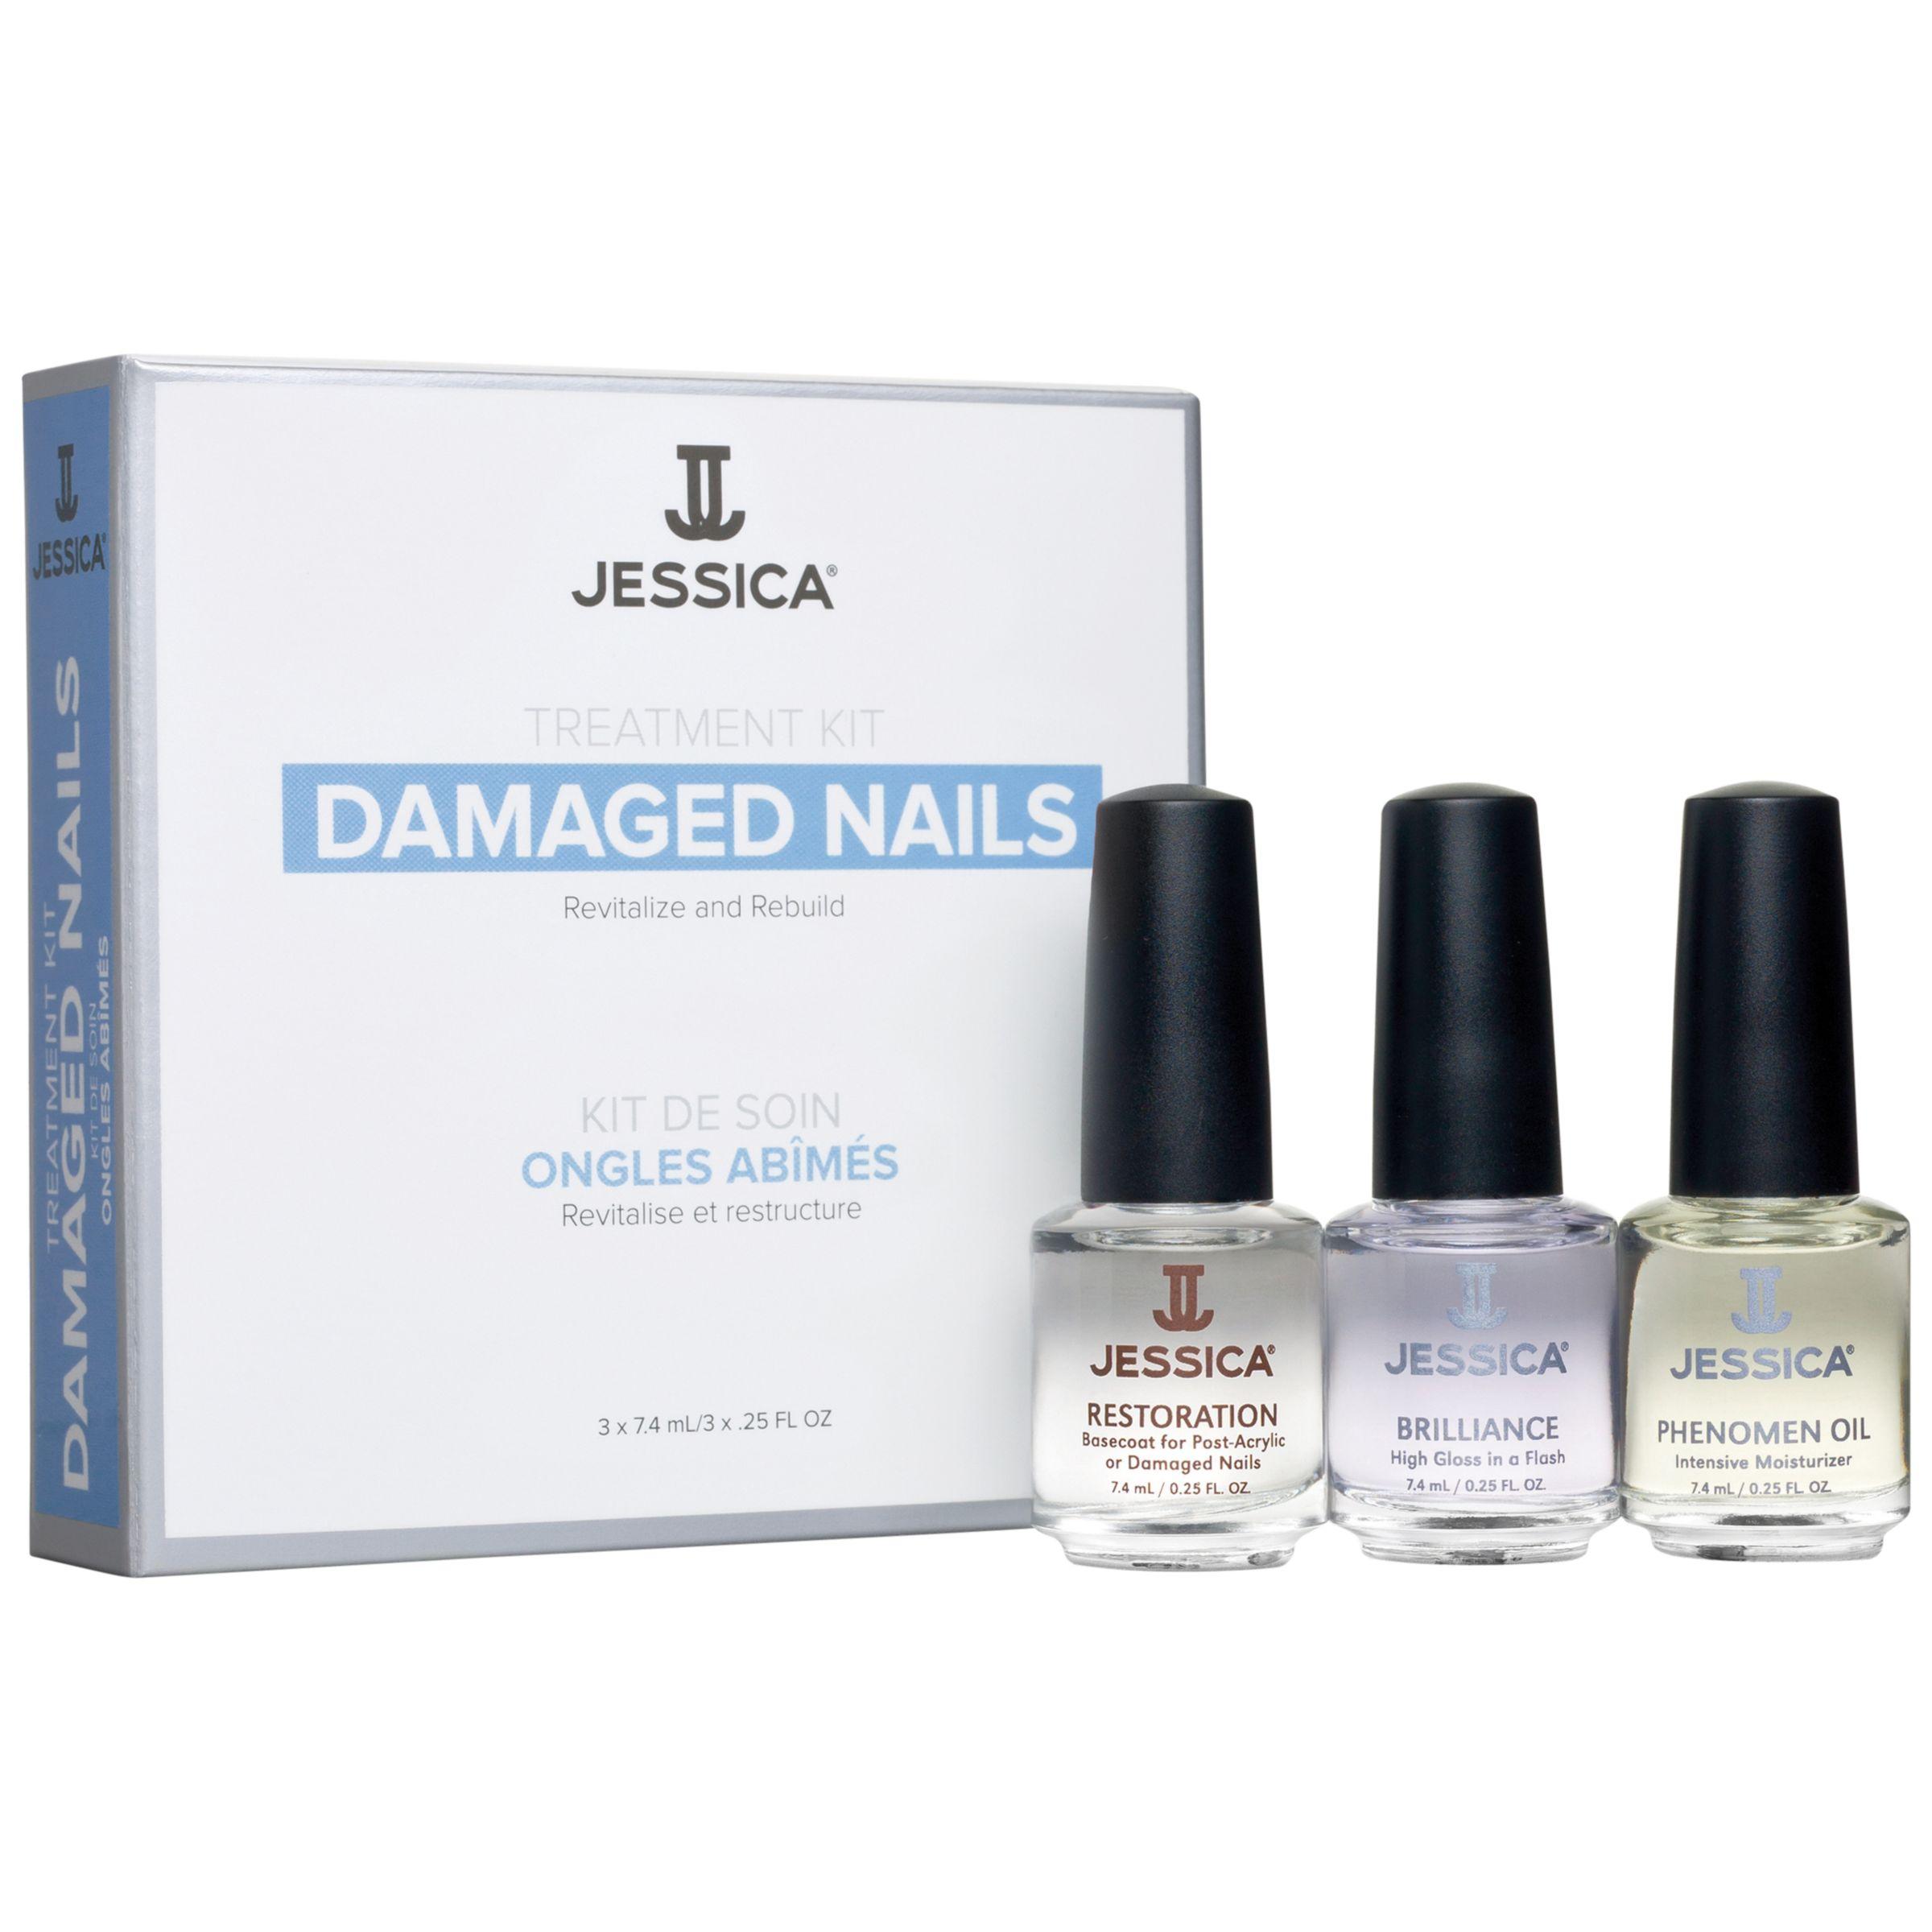 Jessica Jessica Damaged Nails Treatment Kit